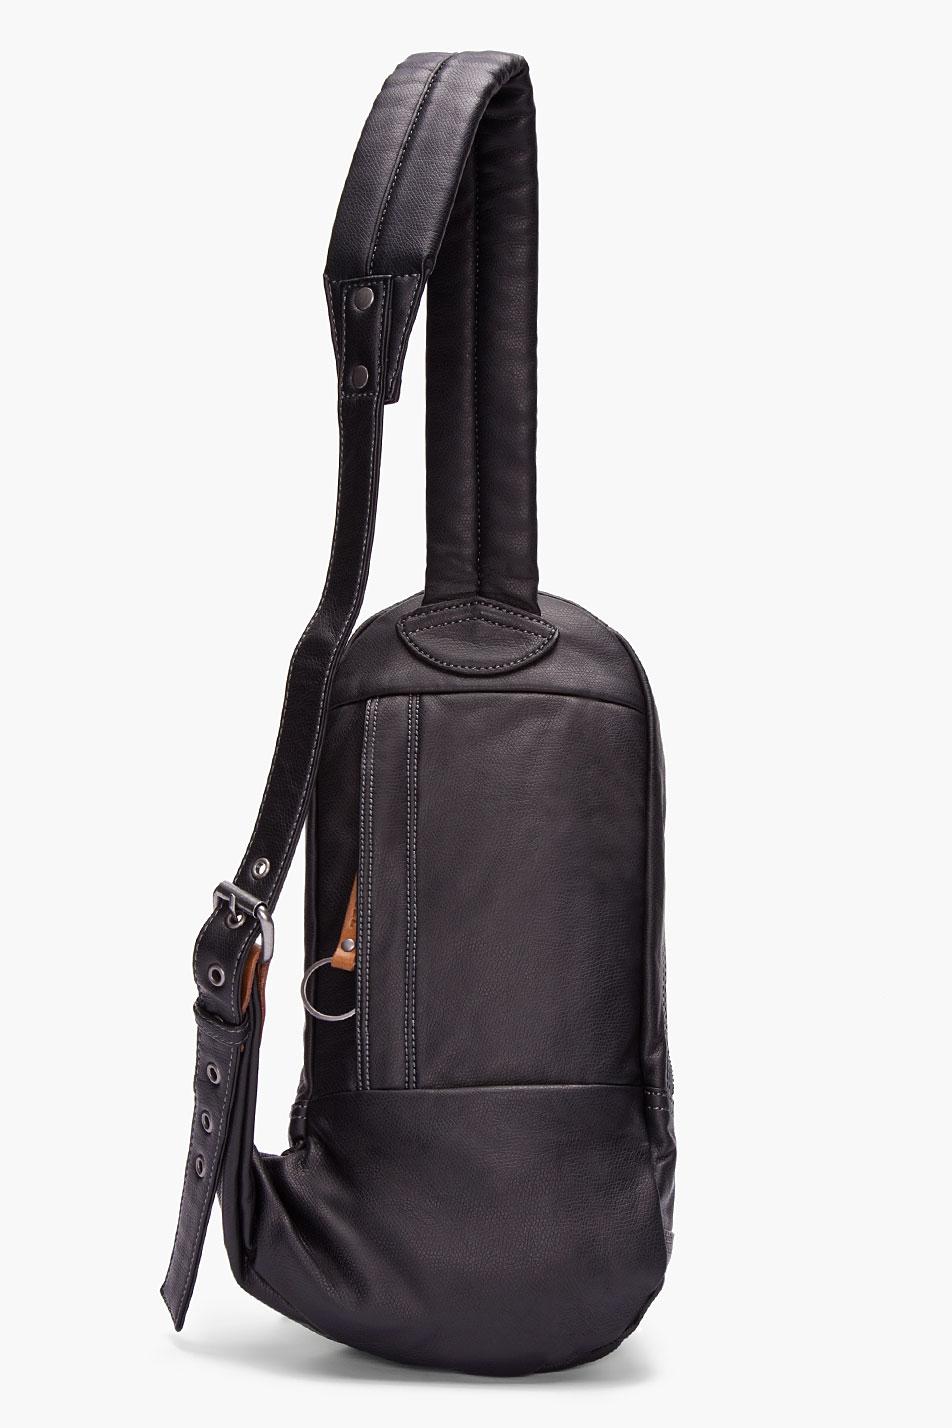 Diesel Black Faux Leather Core Bag in Black for Men | Lyst